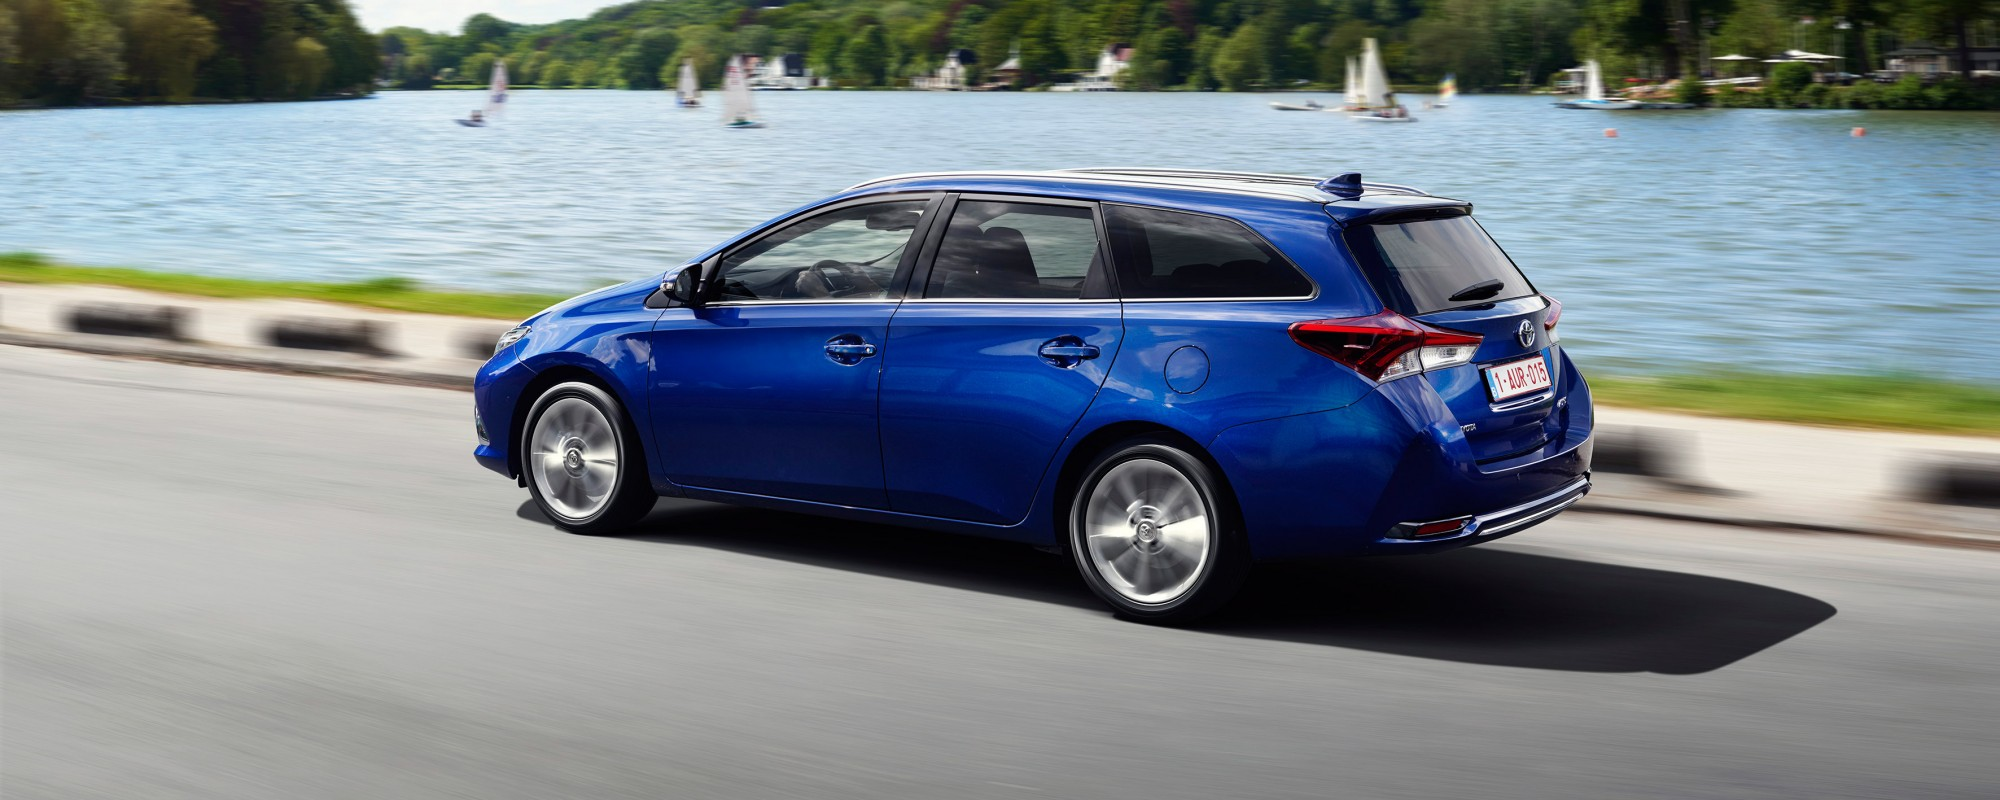 Grote beschikbaarheid Toyota Auris hybride stationwagon